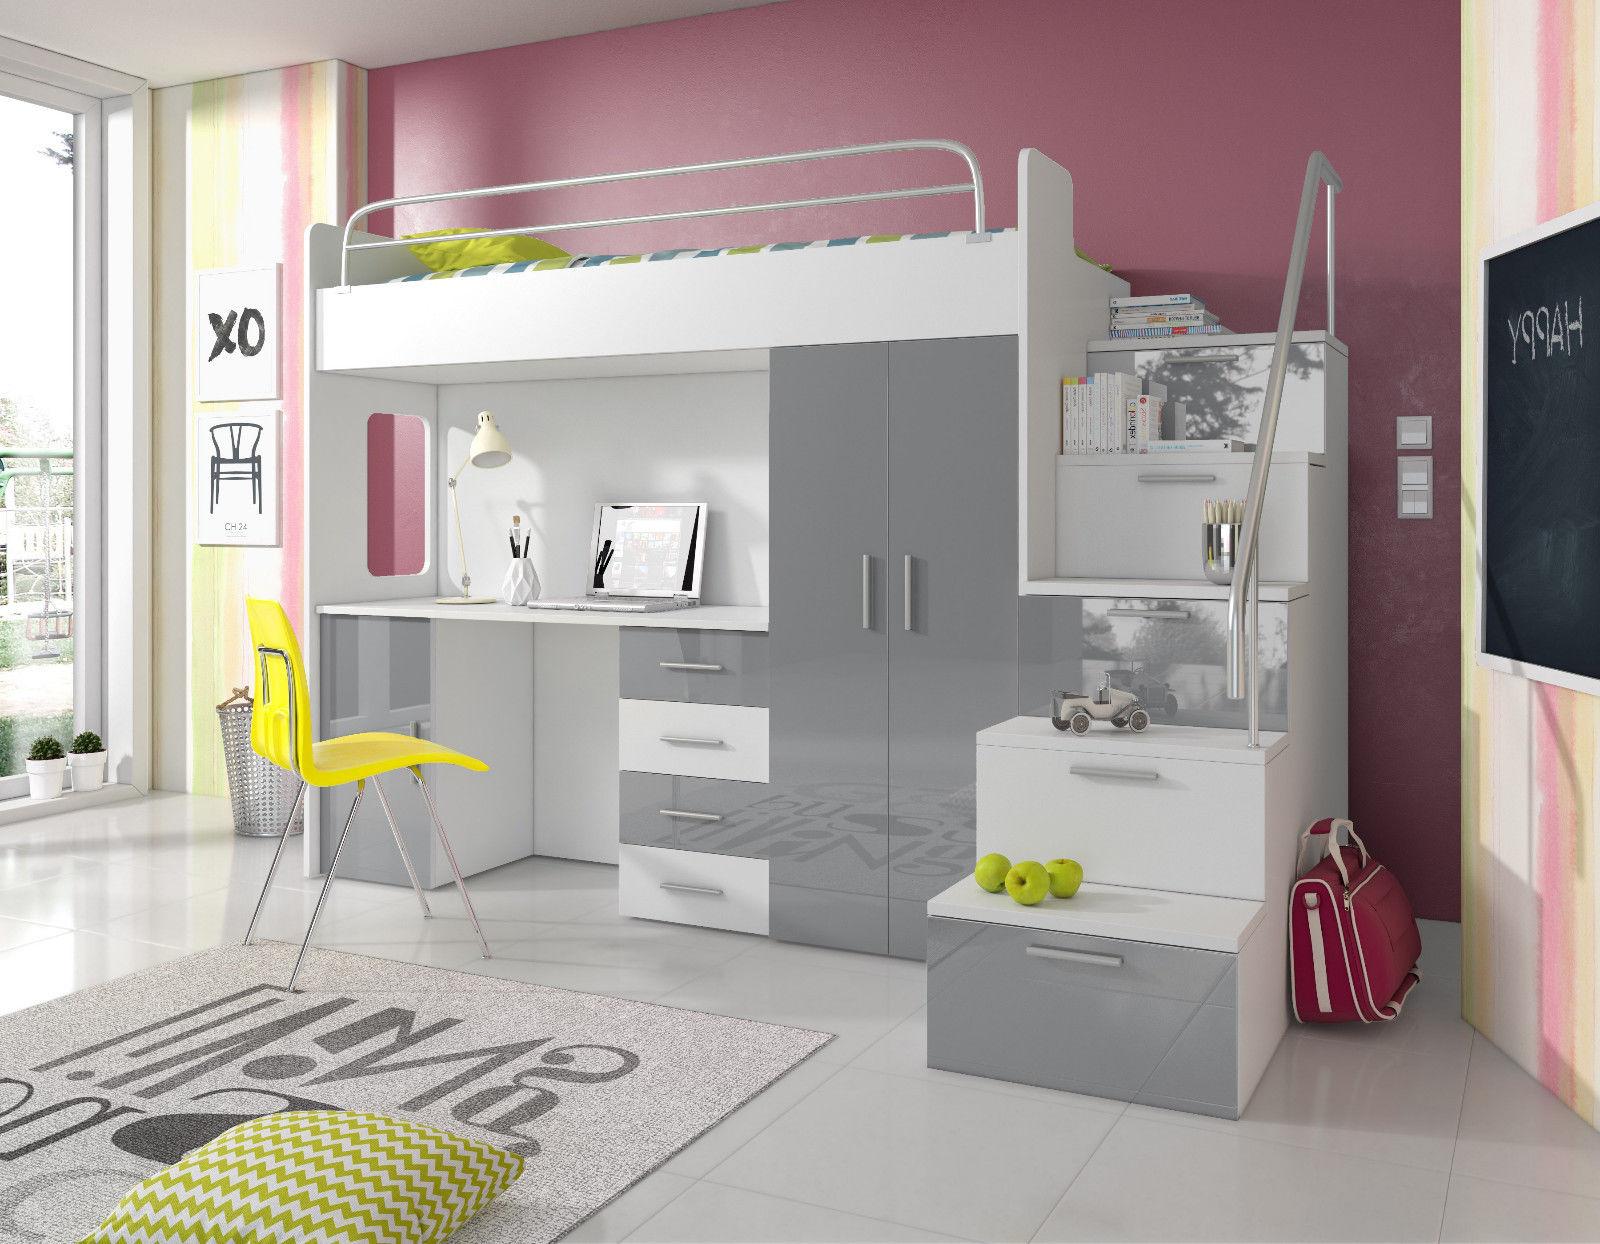 doppelstockbett stockbett bett etagenbett mit schreibtisch. Black Bedroom Furniture Sets. Home Design Ideas